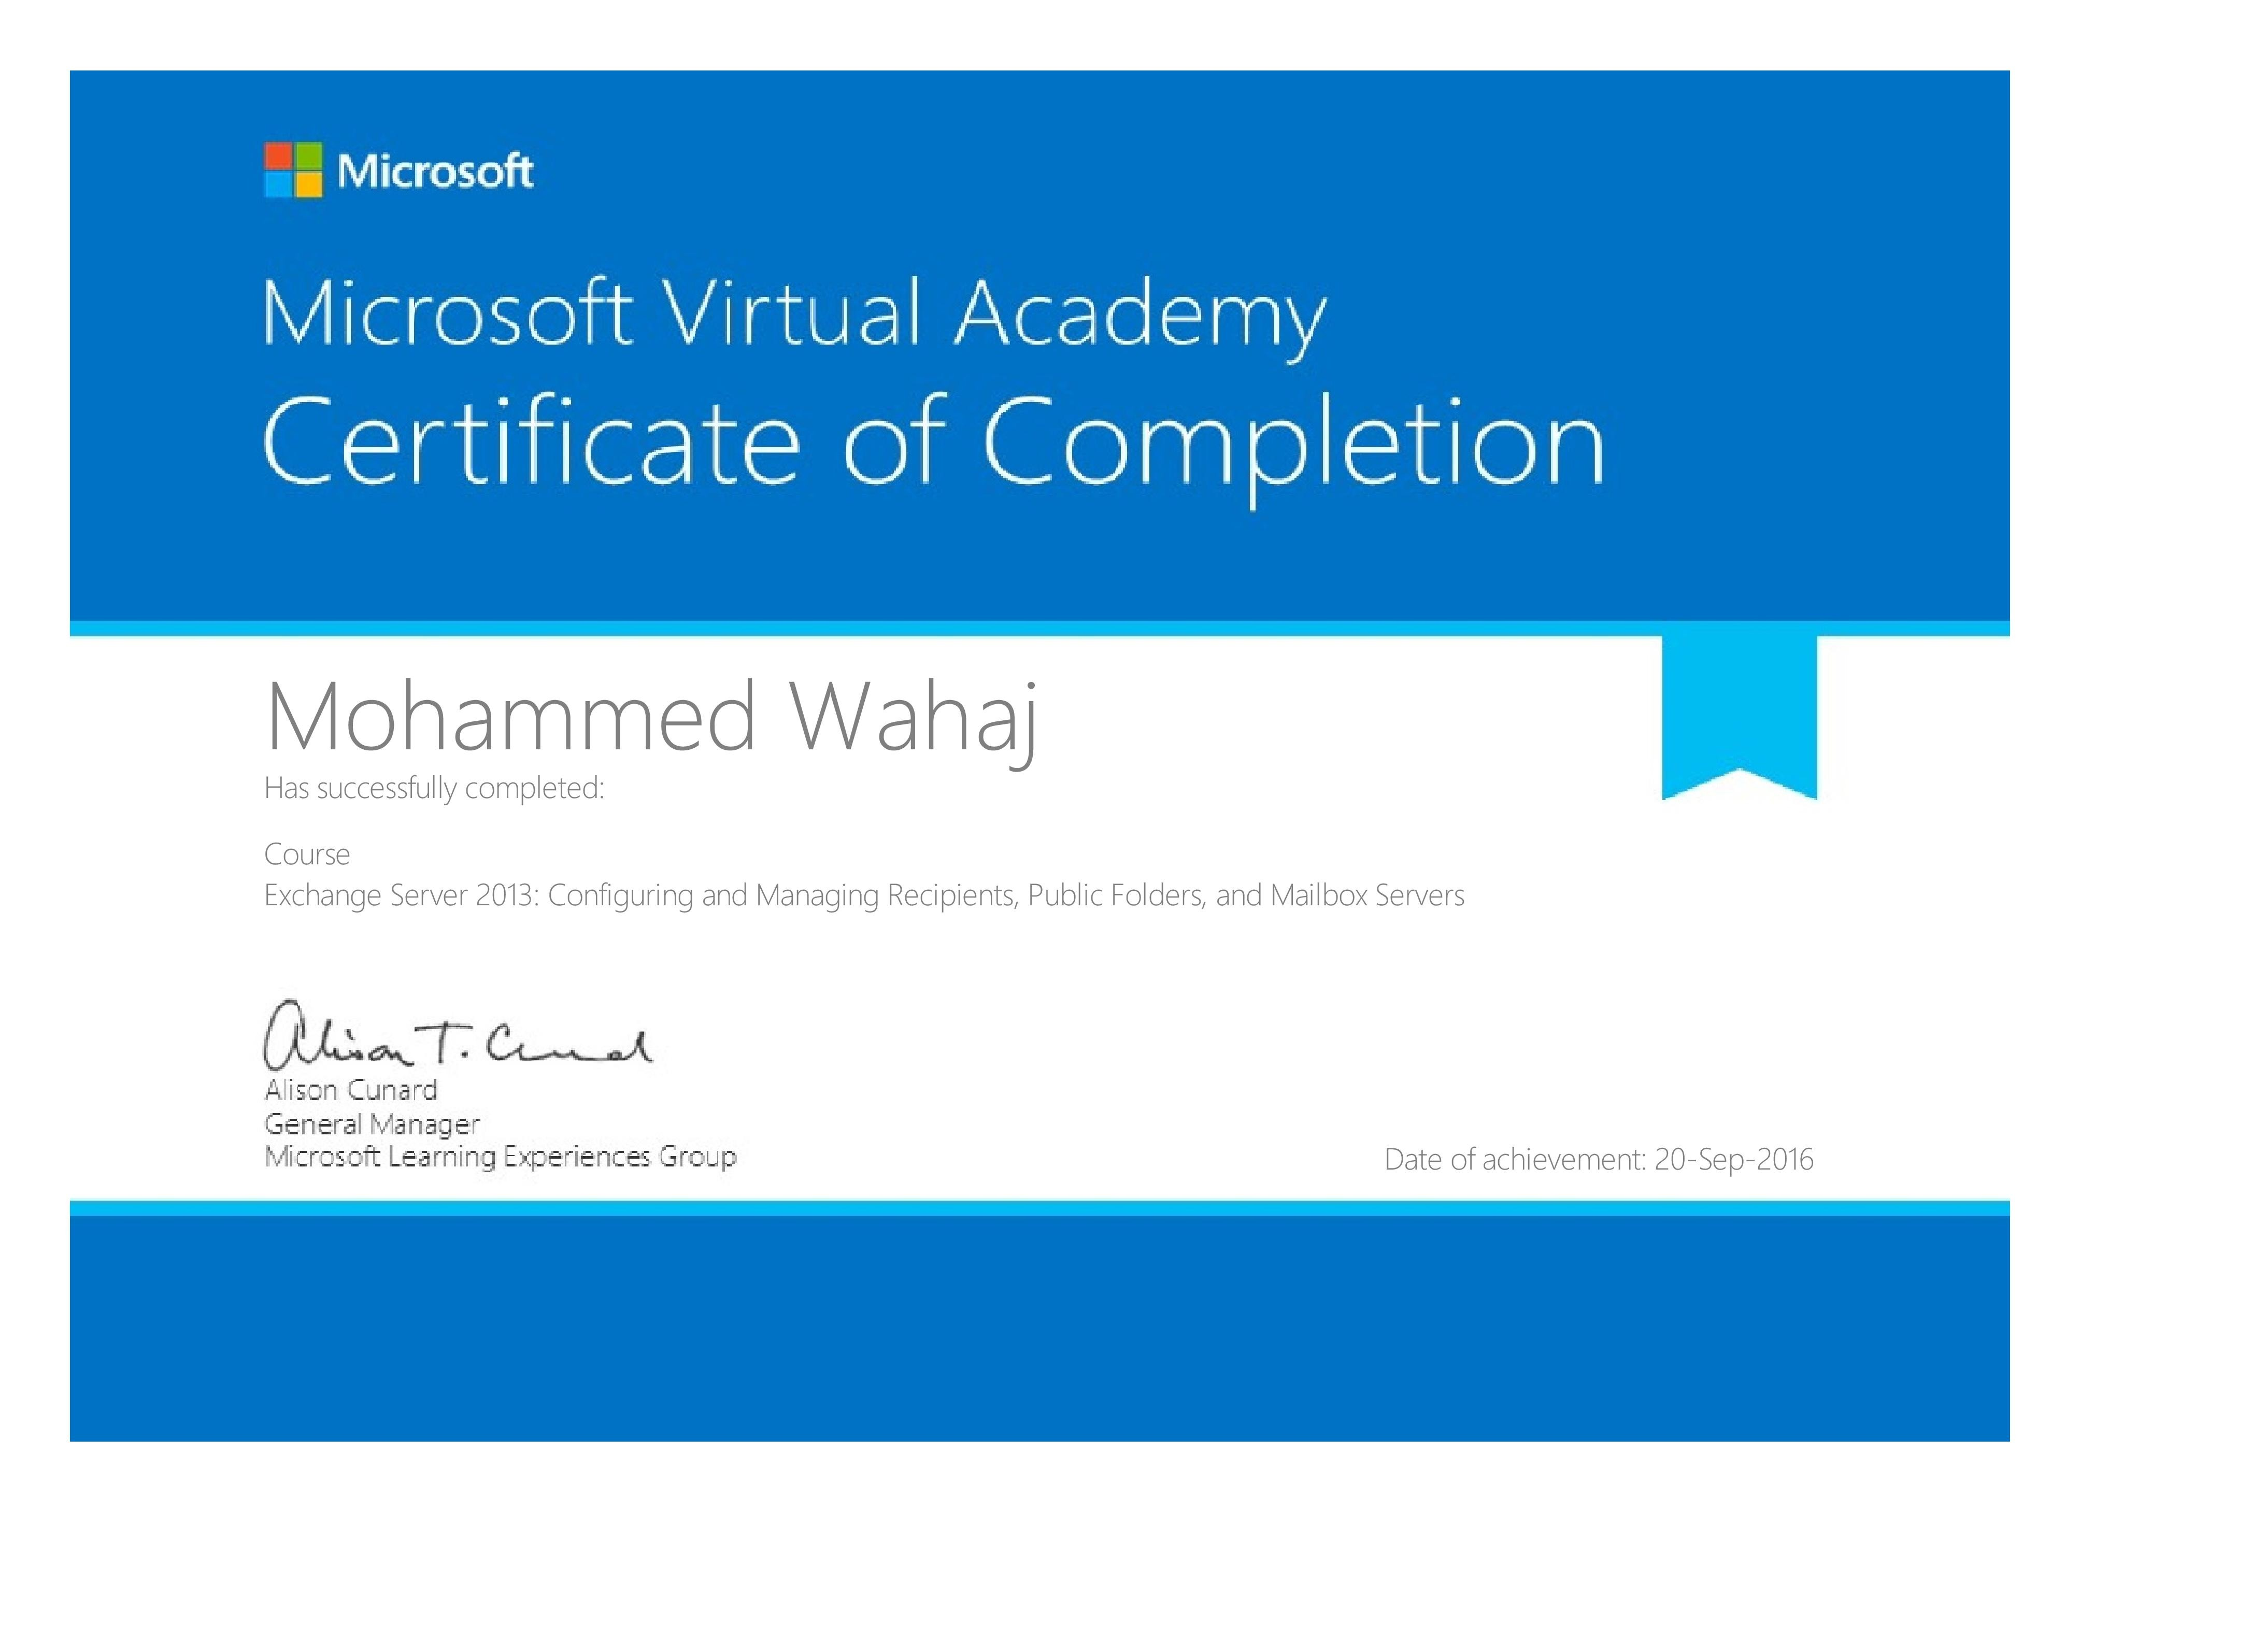 Mohammed wahaj sagheer uddin bayt microsoft exchange server 2013 certificate xflitez Images